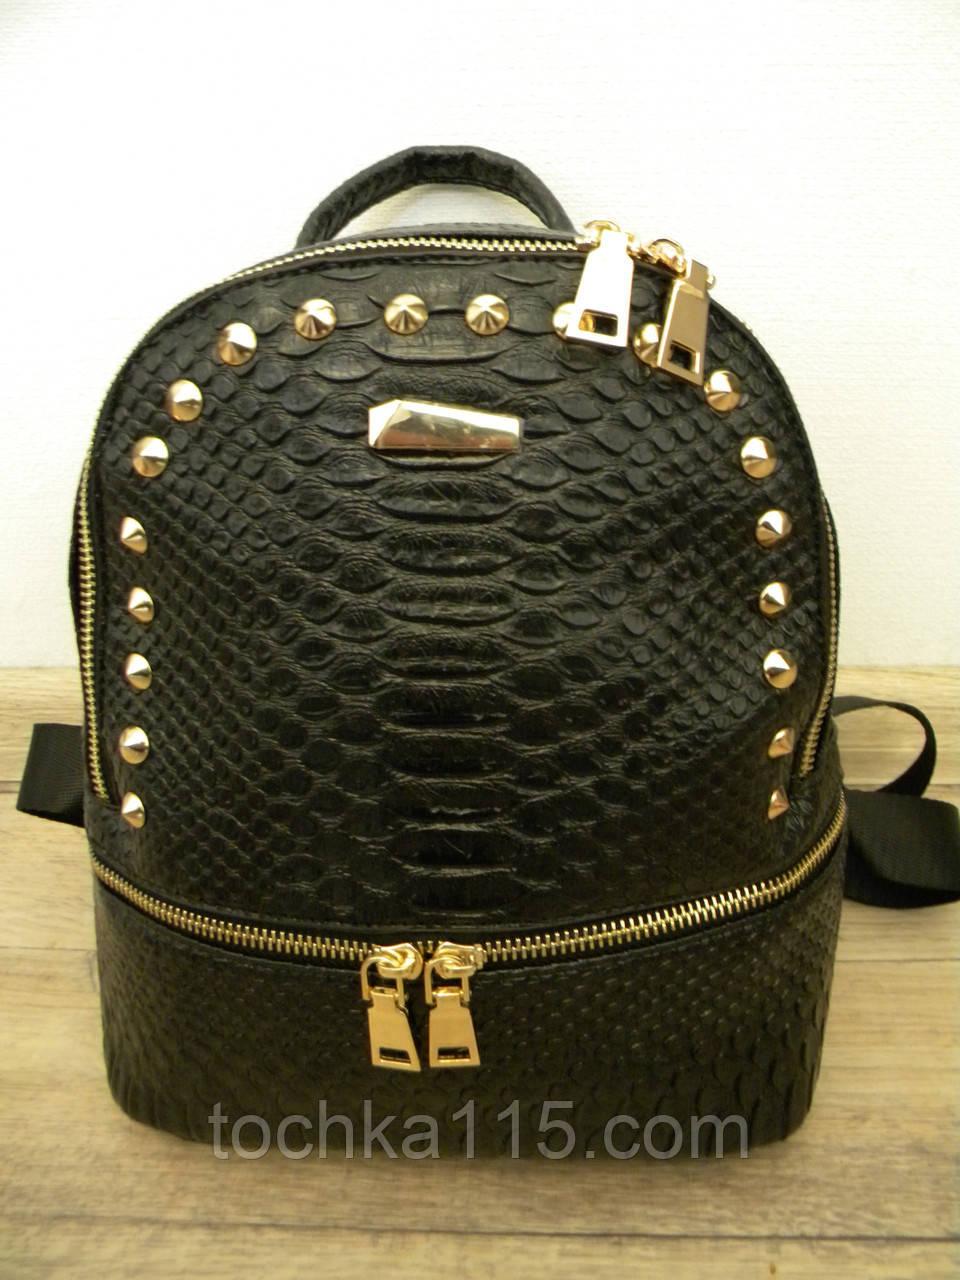 8109c3bc3cd3 Женский мини рюкзак змея, рюкзак для девочек, модный рюкзак, рюкзак для  модниц